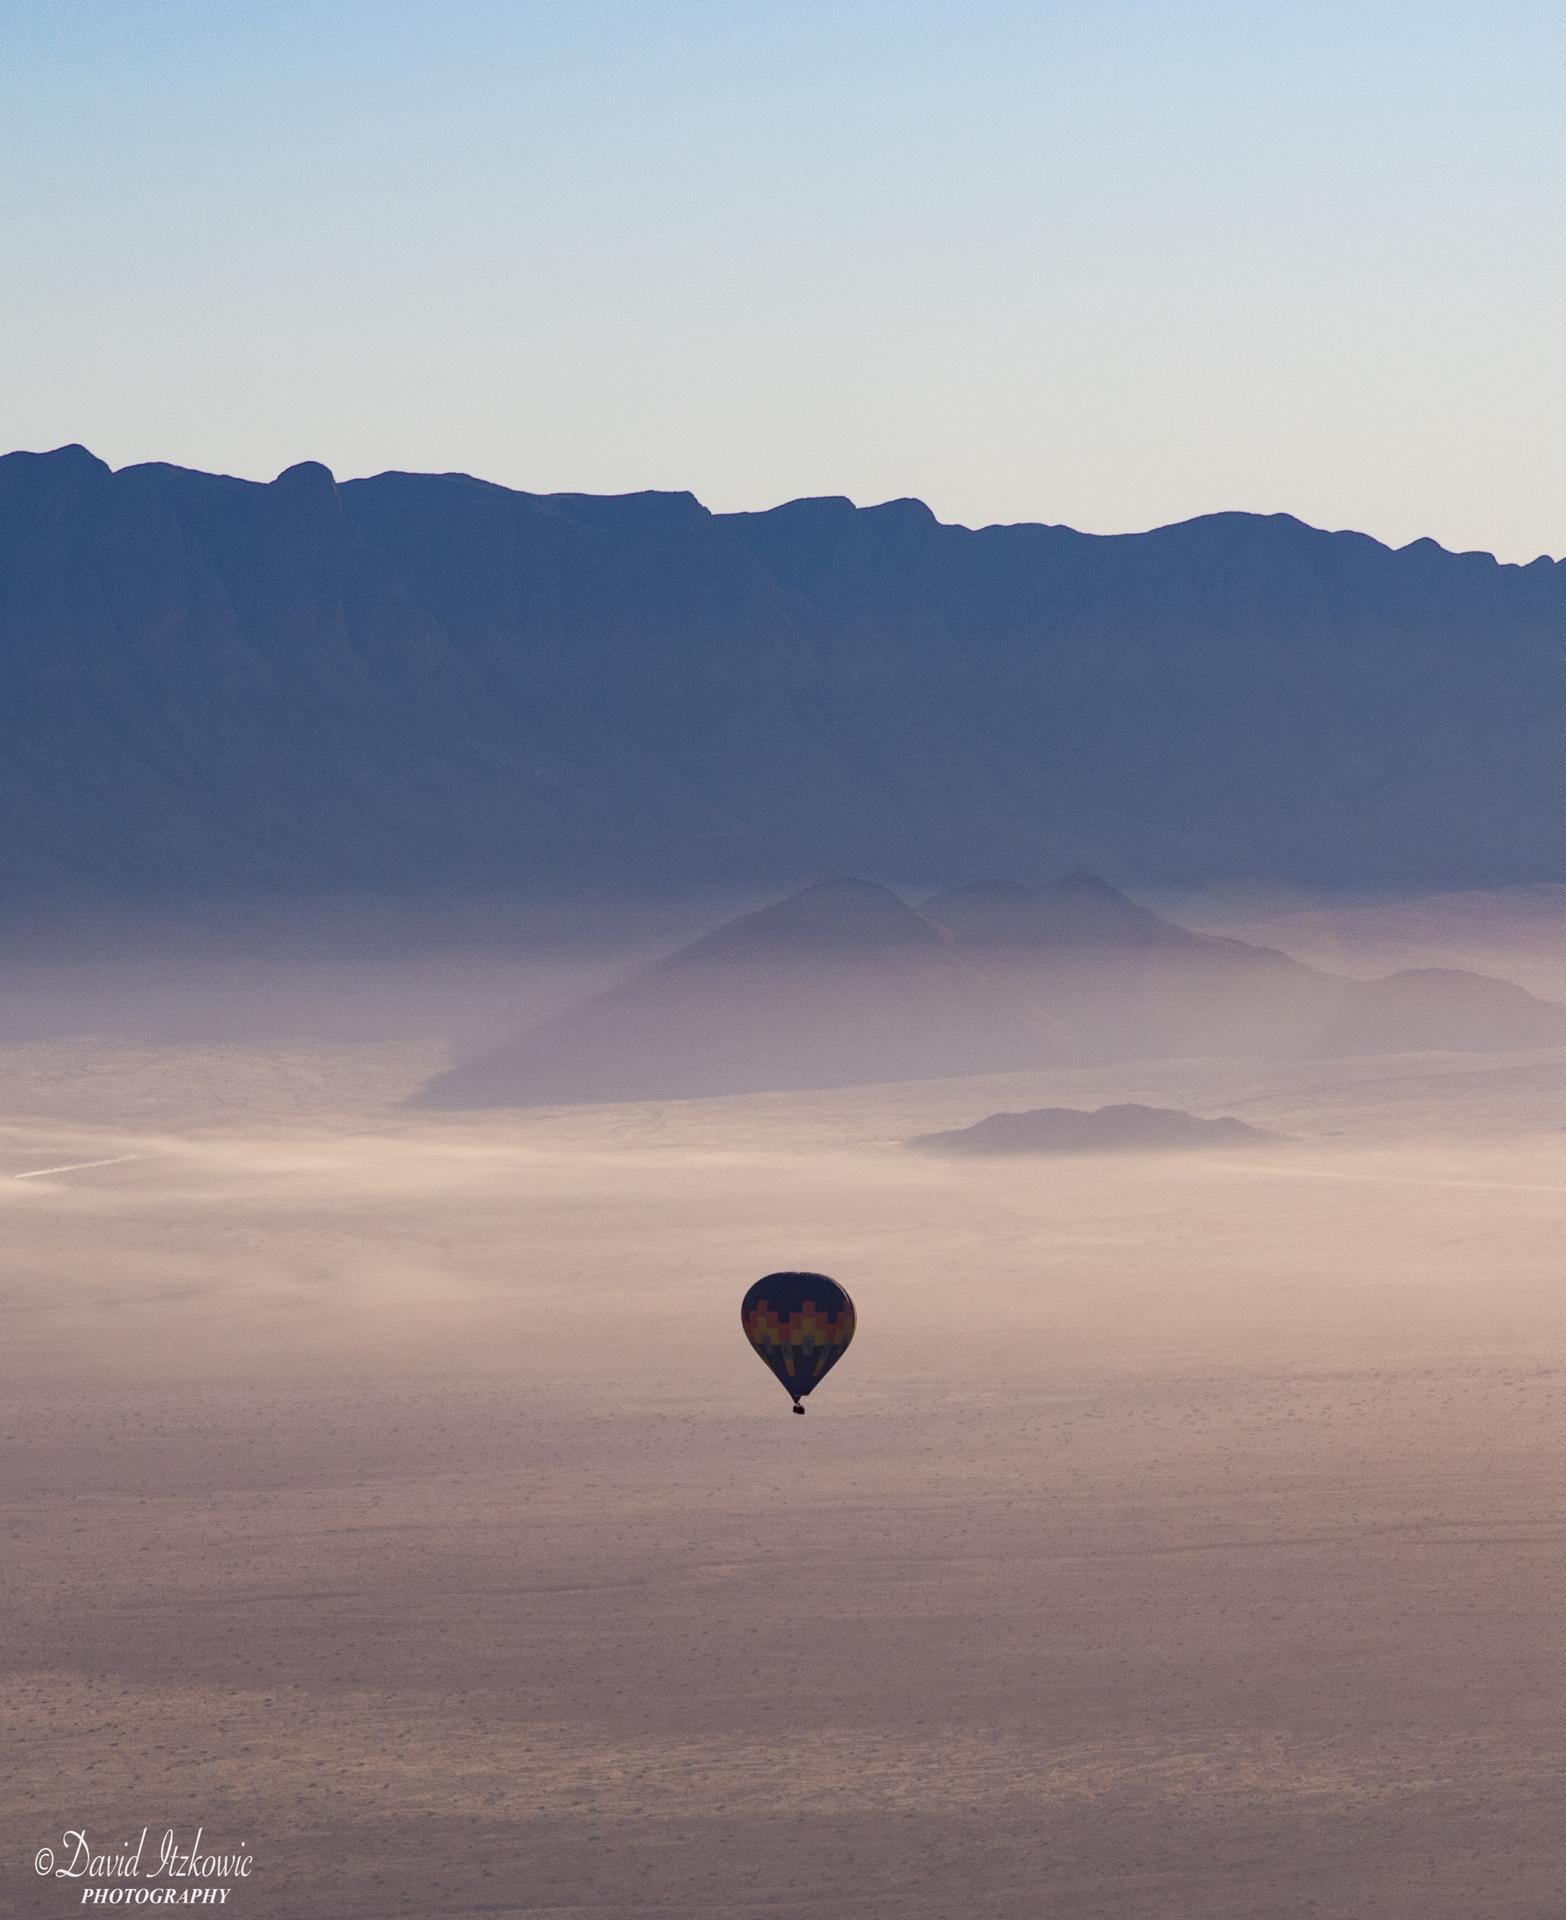 Hot balloon in the desert